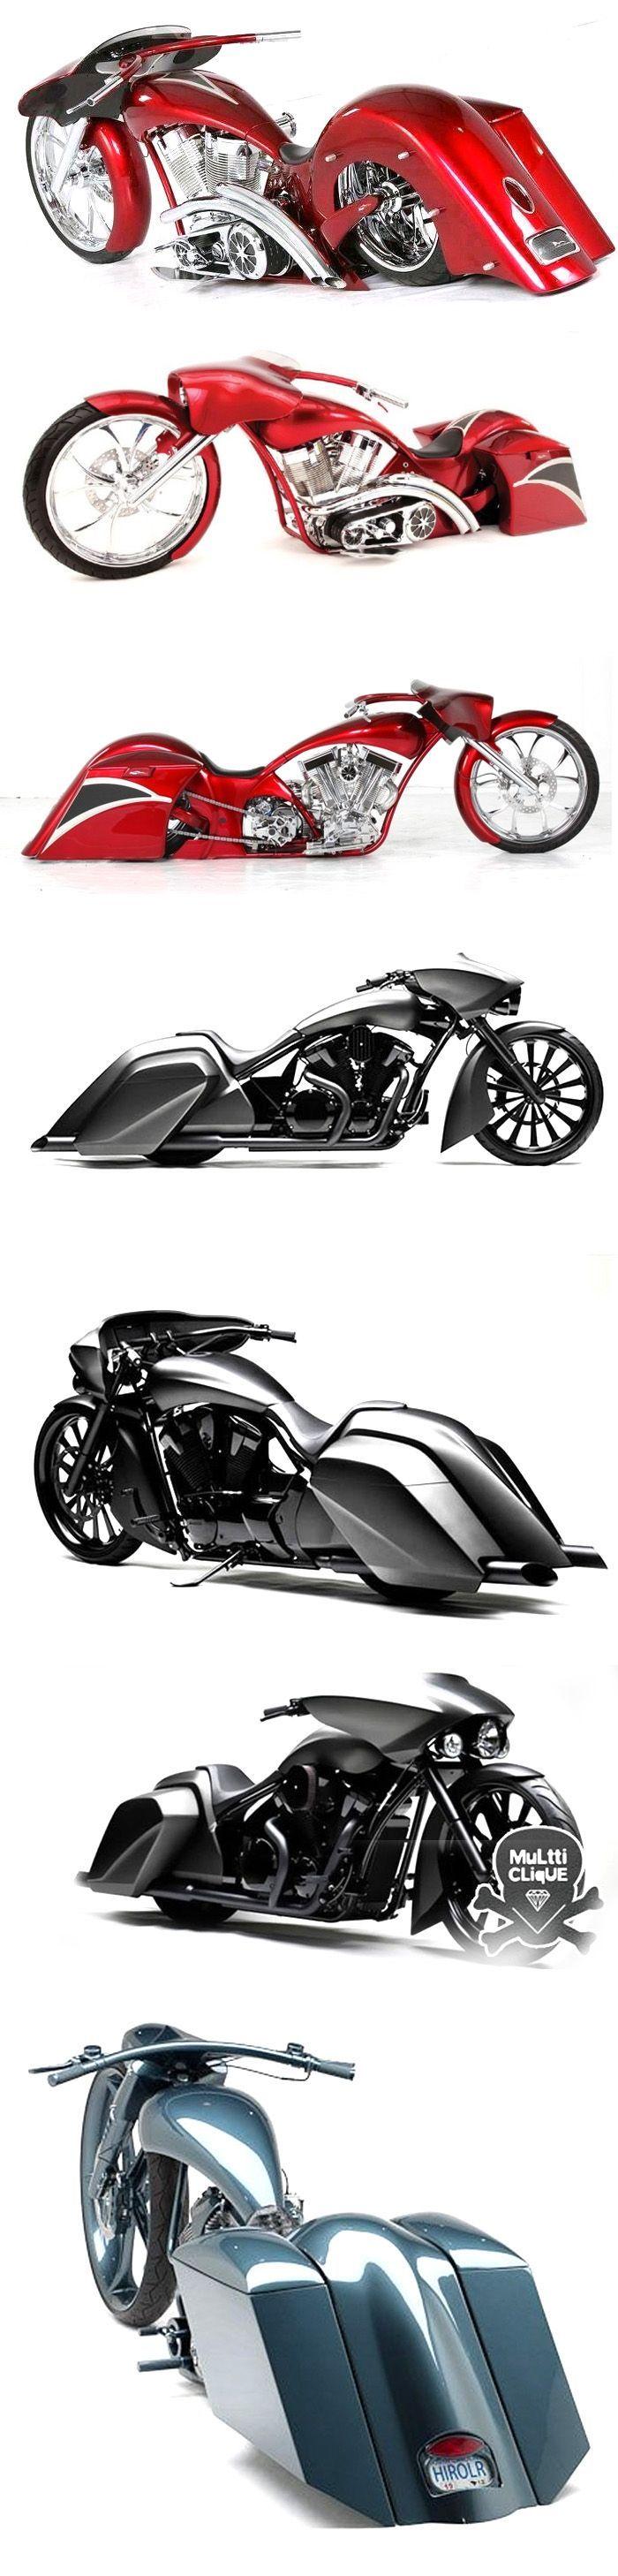 #baggers #motorcycles